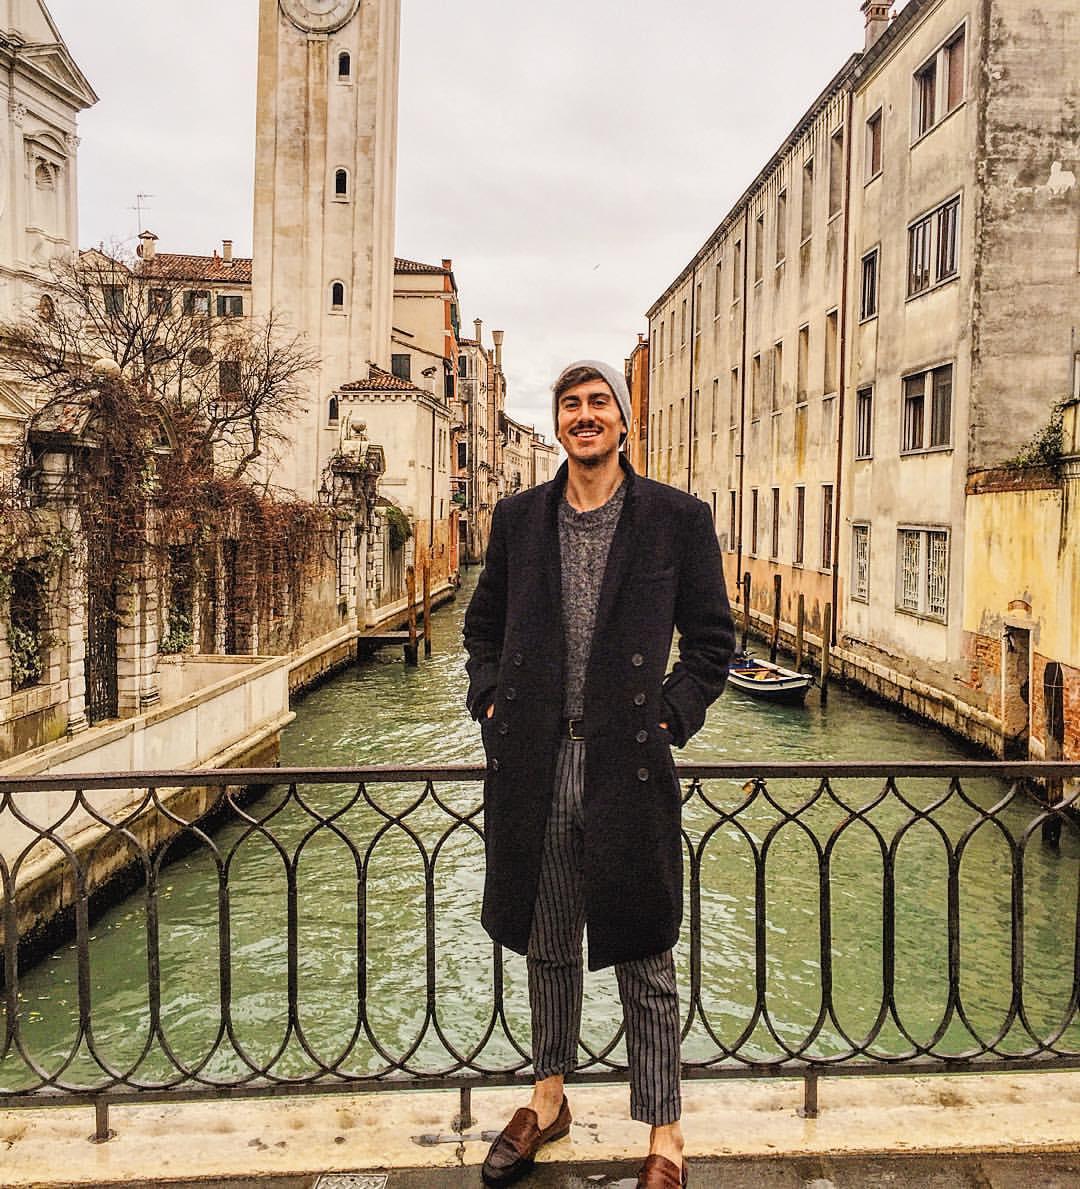 Definitely could start my gondola business rocking this look #Venice #stache  (at San Giorgio dei Greci)